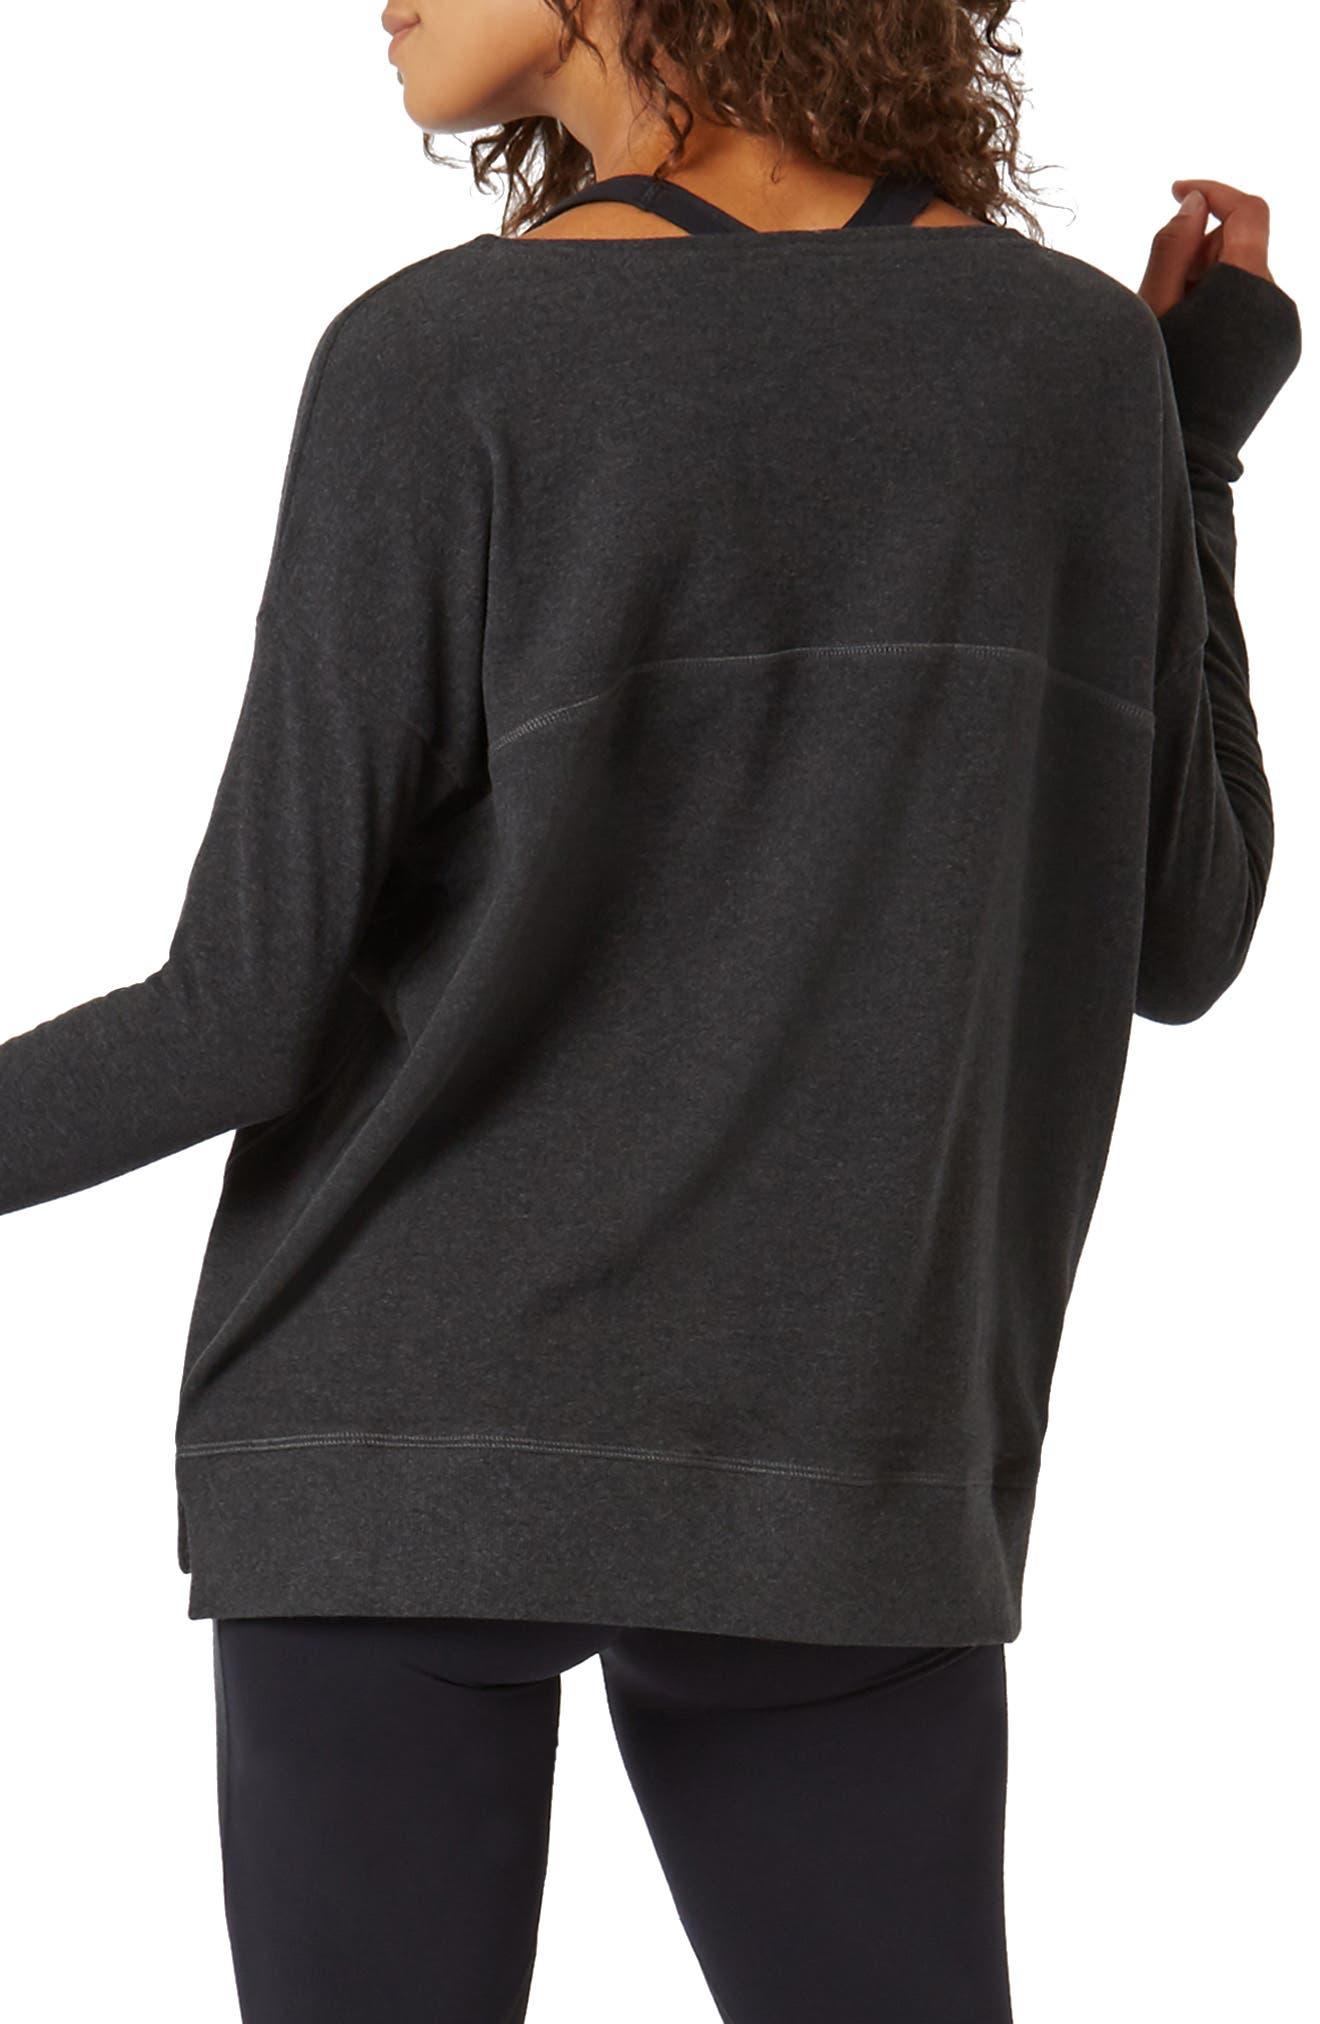 Luxe Simhasana Sweatshirt,                             Alternate thumbnail 2, color,                             BLACK MARL